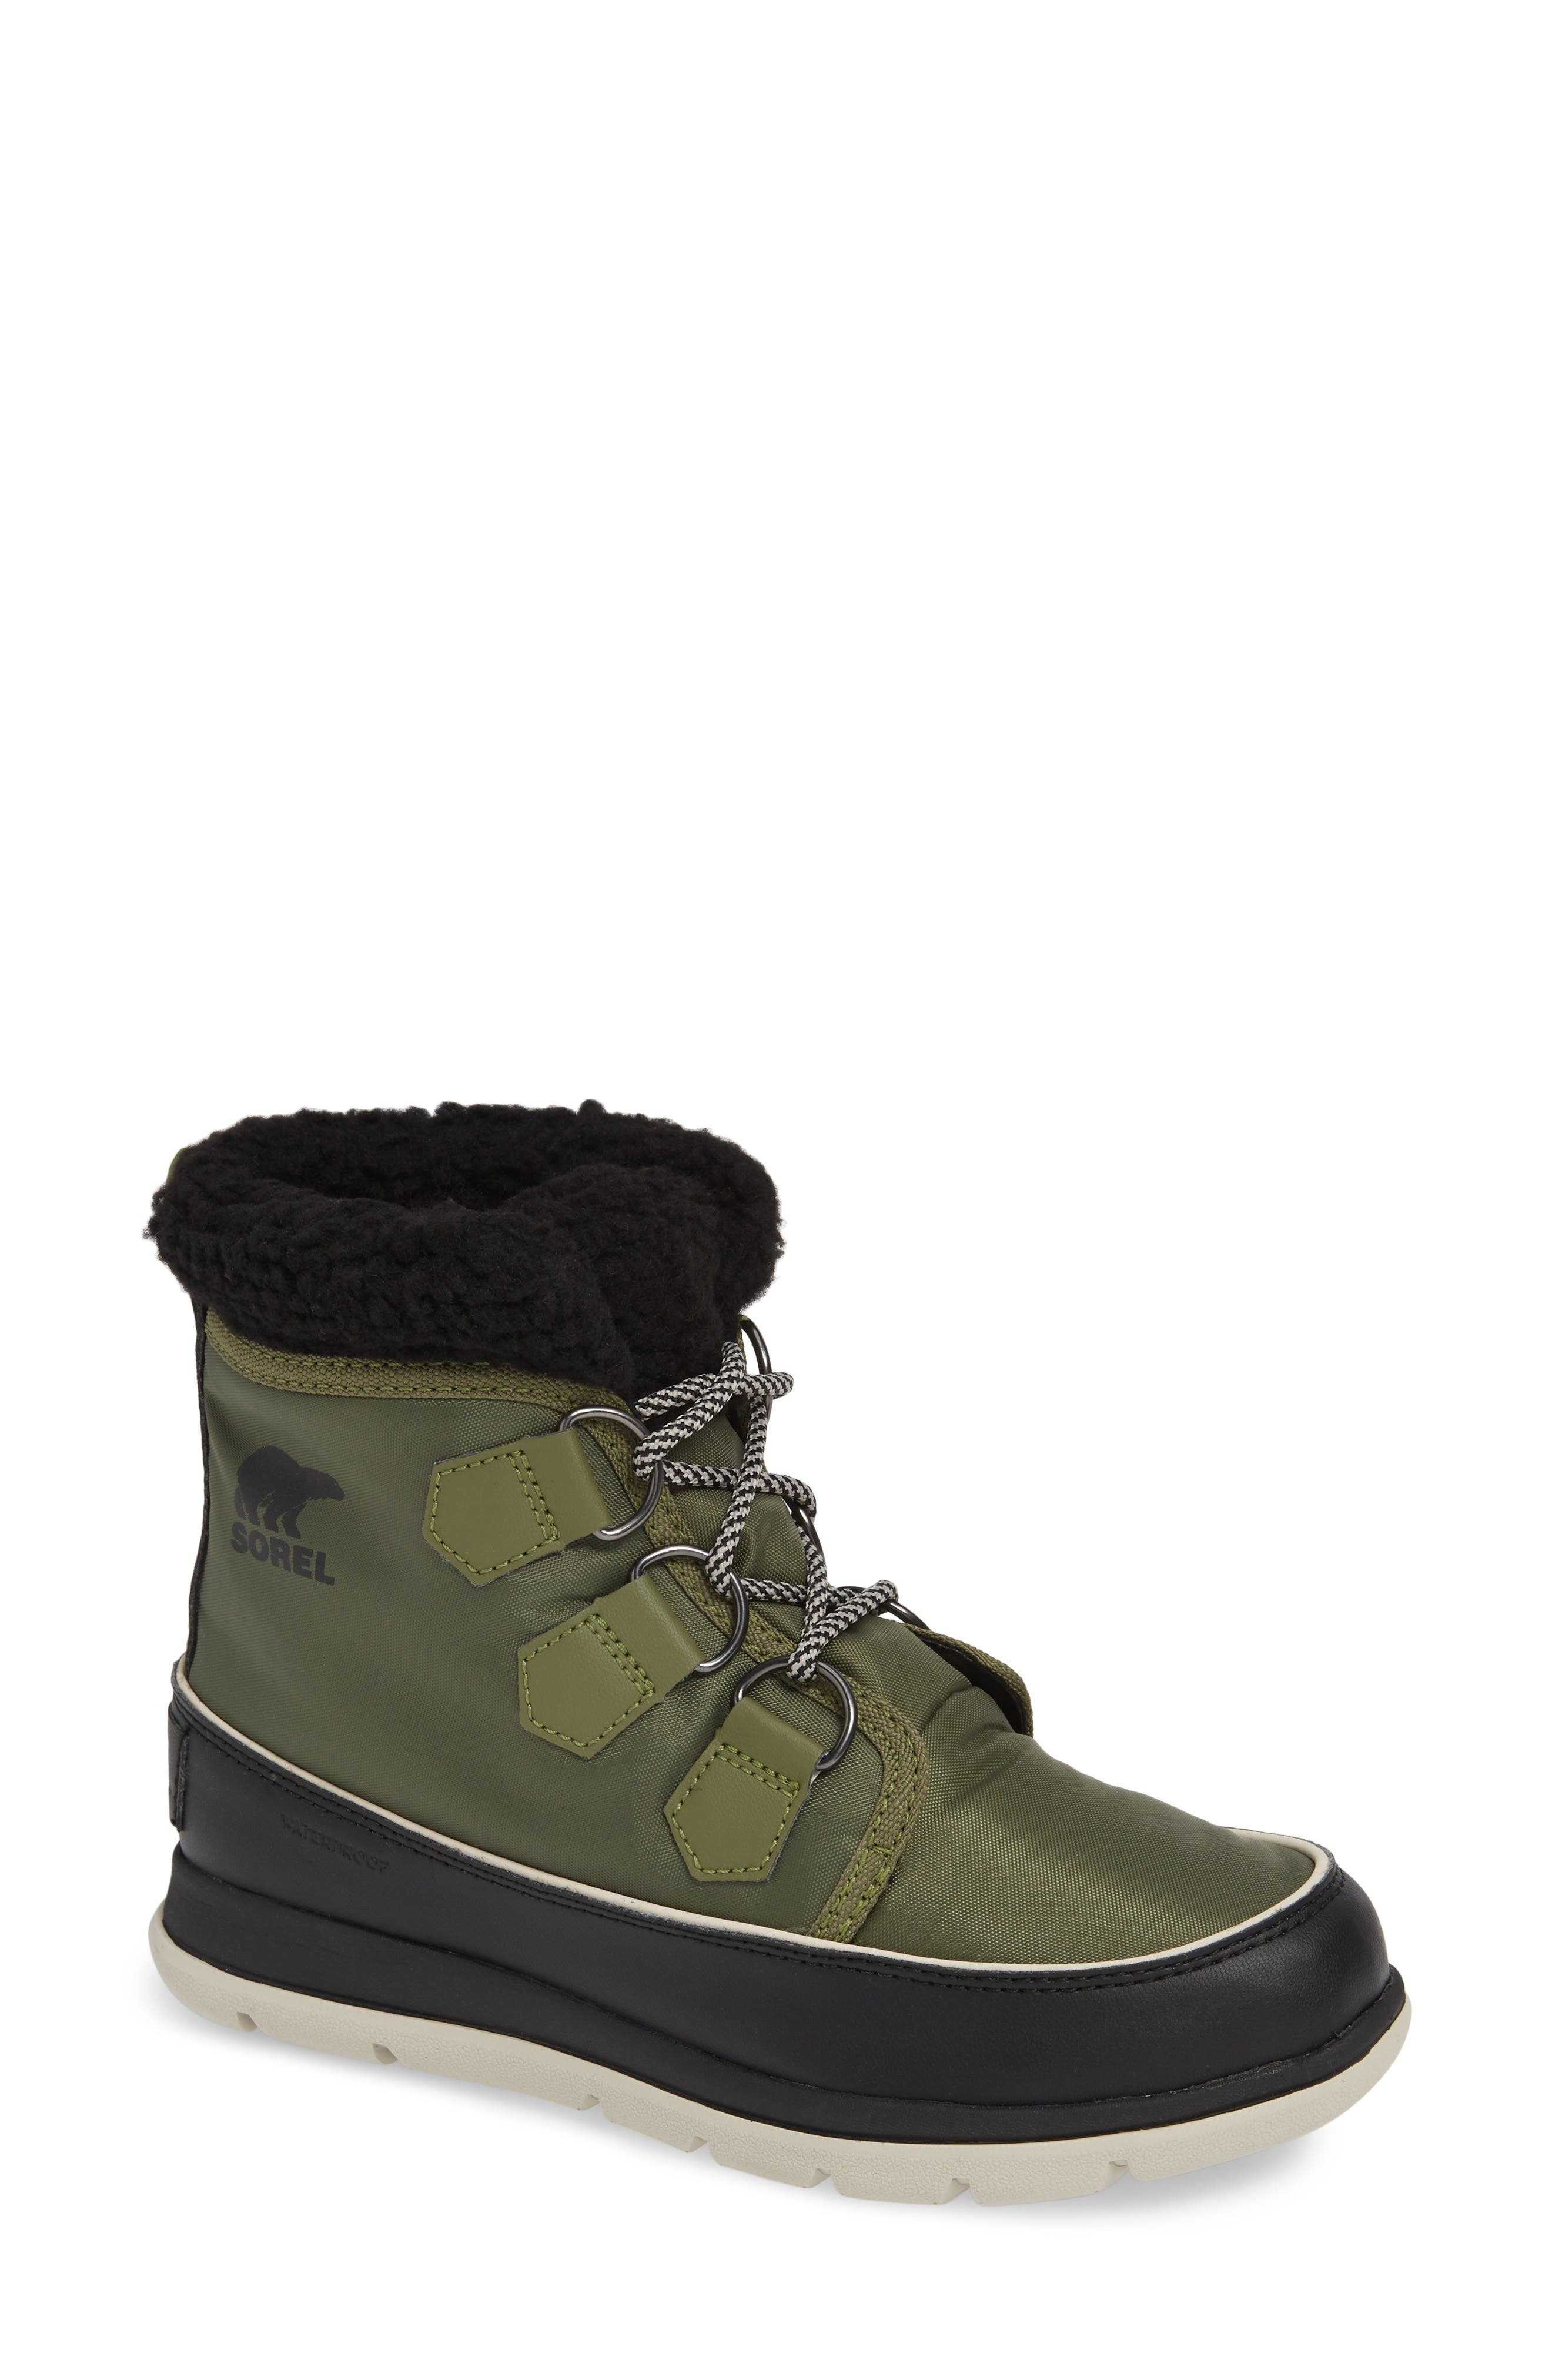 Explorer Carnival Waterproof Boot with Faux Fur Collar,                             Main thumbnail 1, color,                             HIKER GREEN